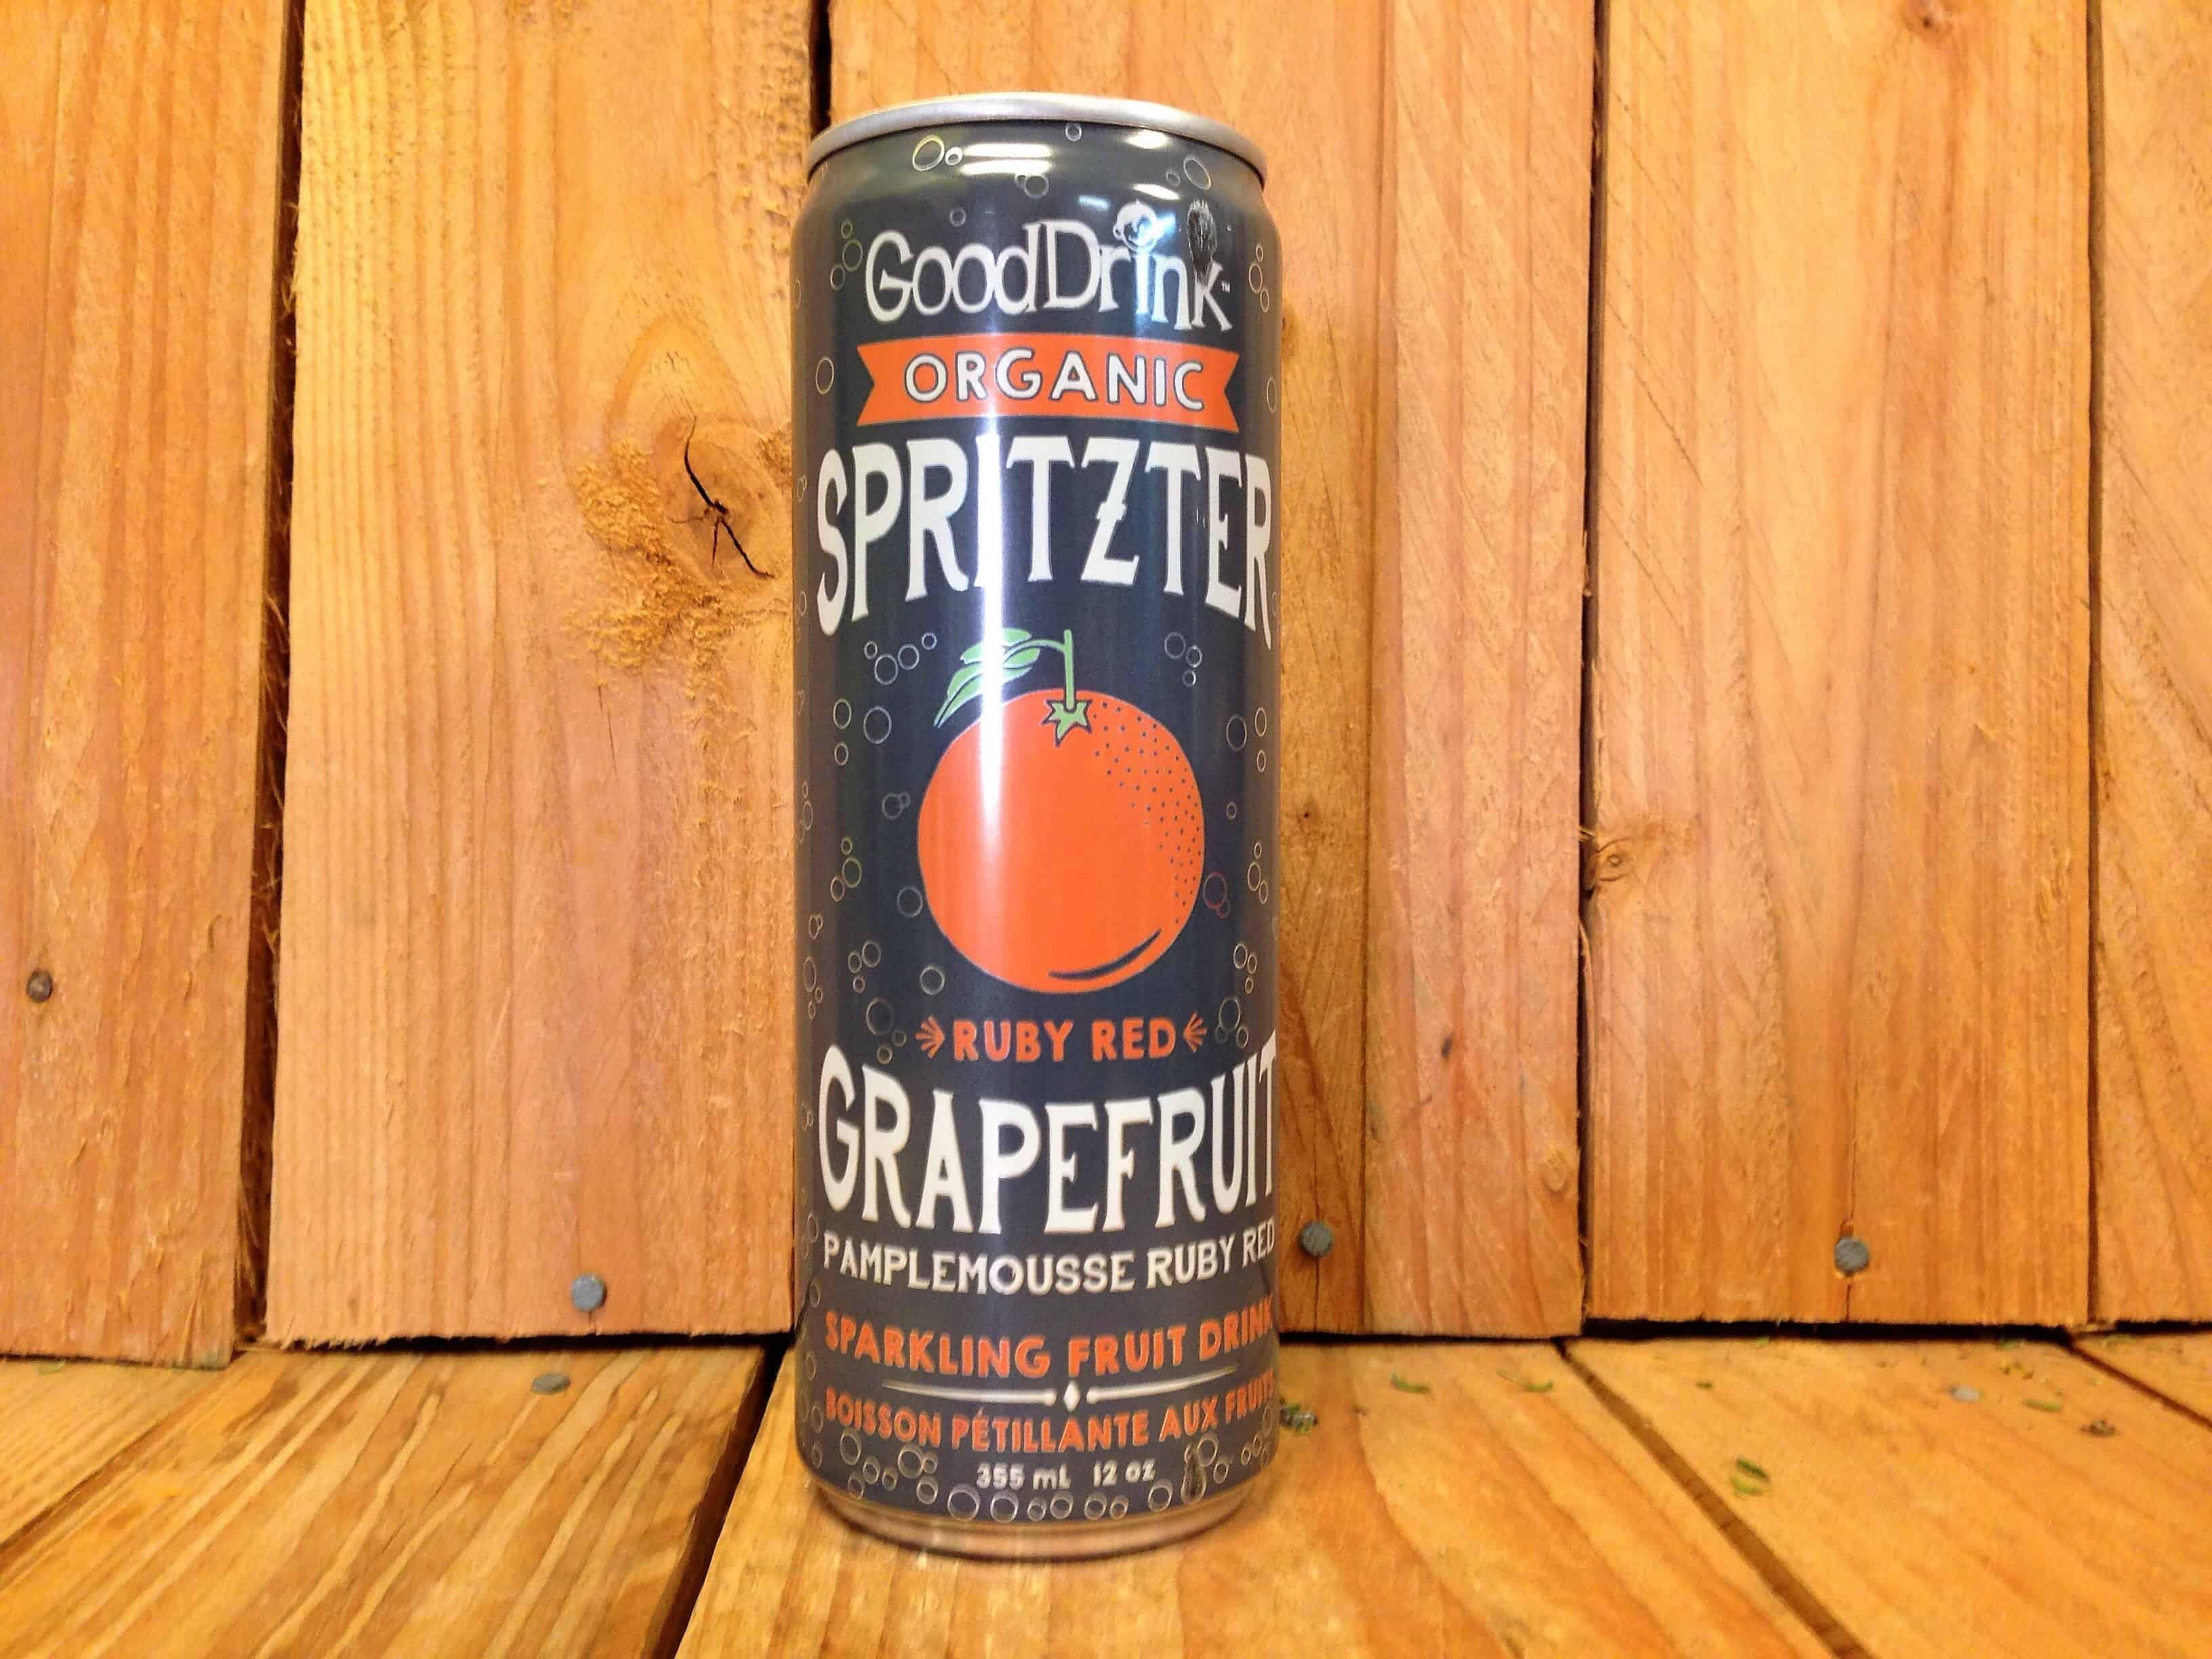 Good Drink Organic – Ruby Red Grapefruit Spritzter (355ml)